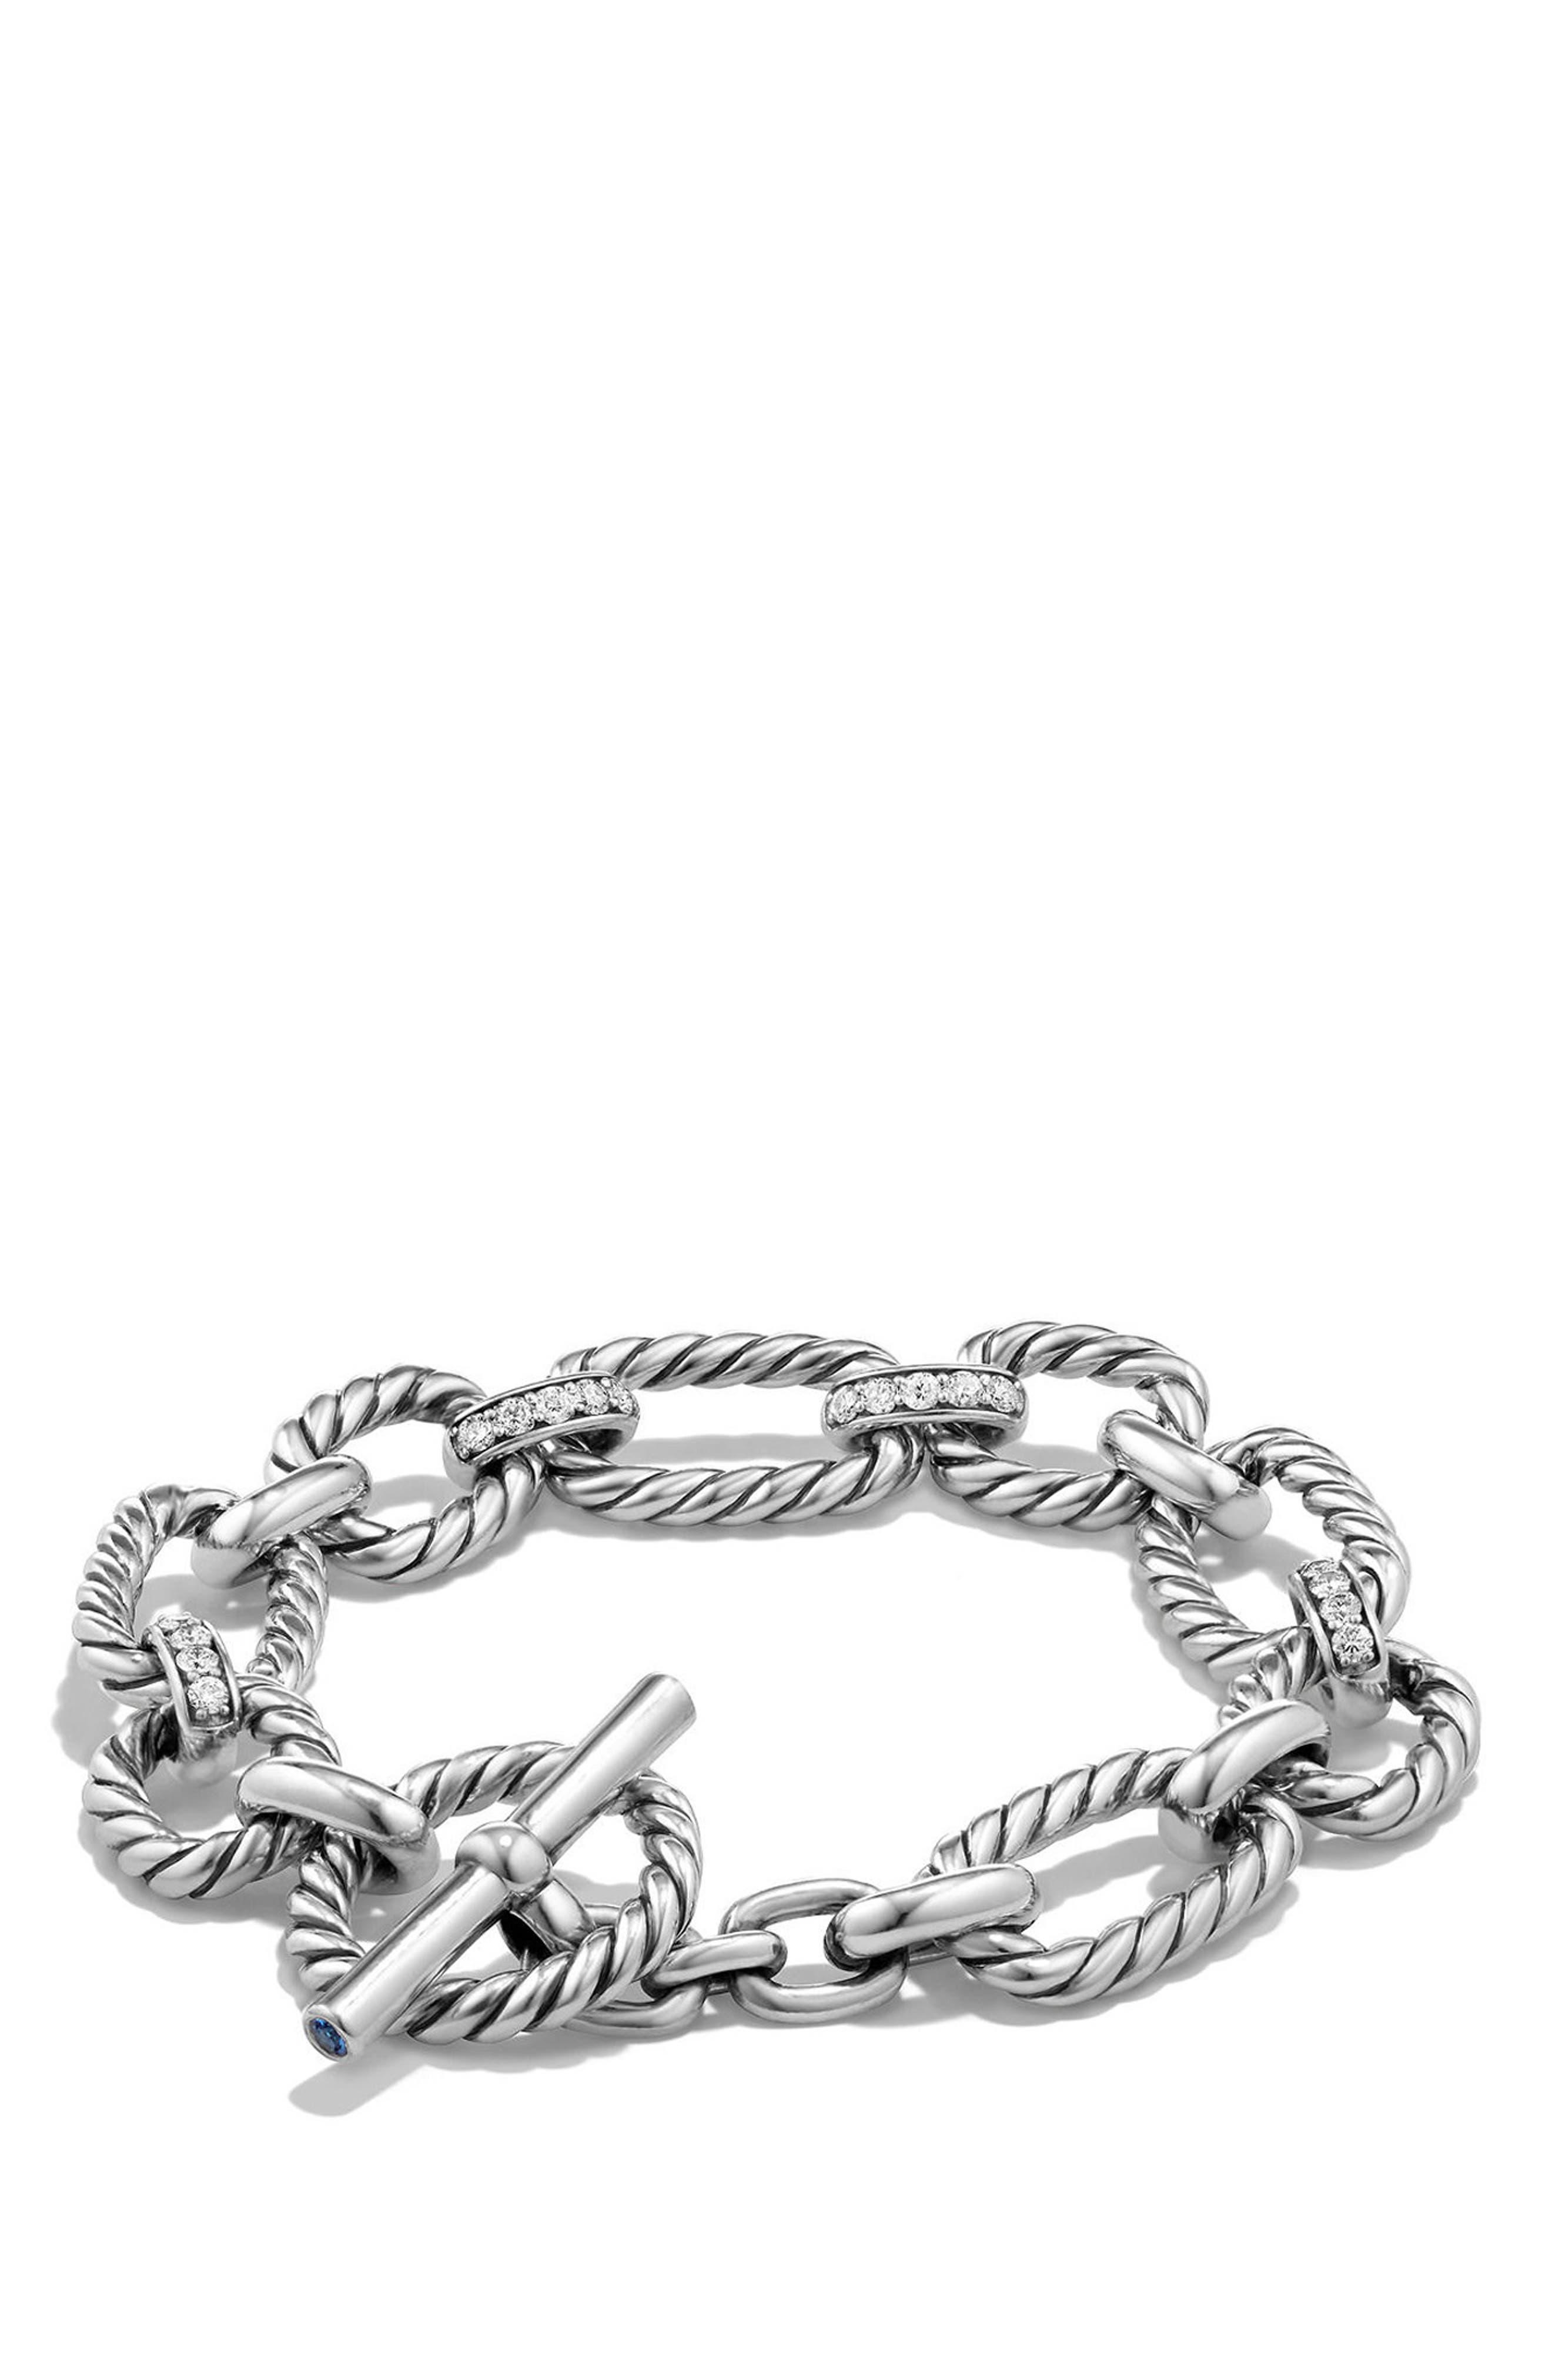 'Chain' Cushion Link Bracelet with Diamonds,                             Main thumbnail 1, color,                             SILVER